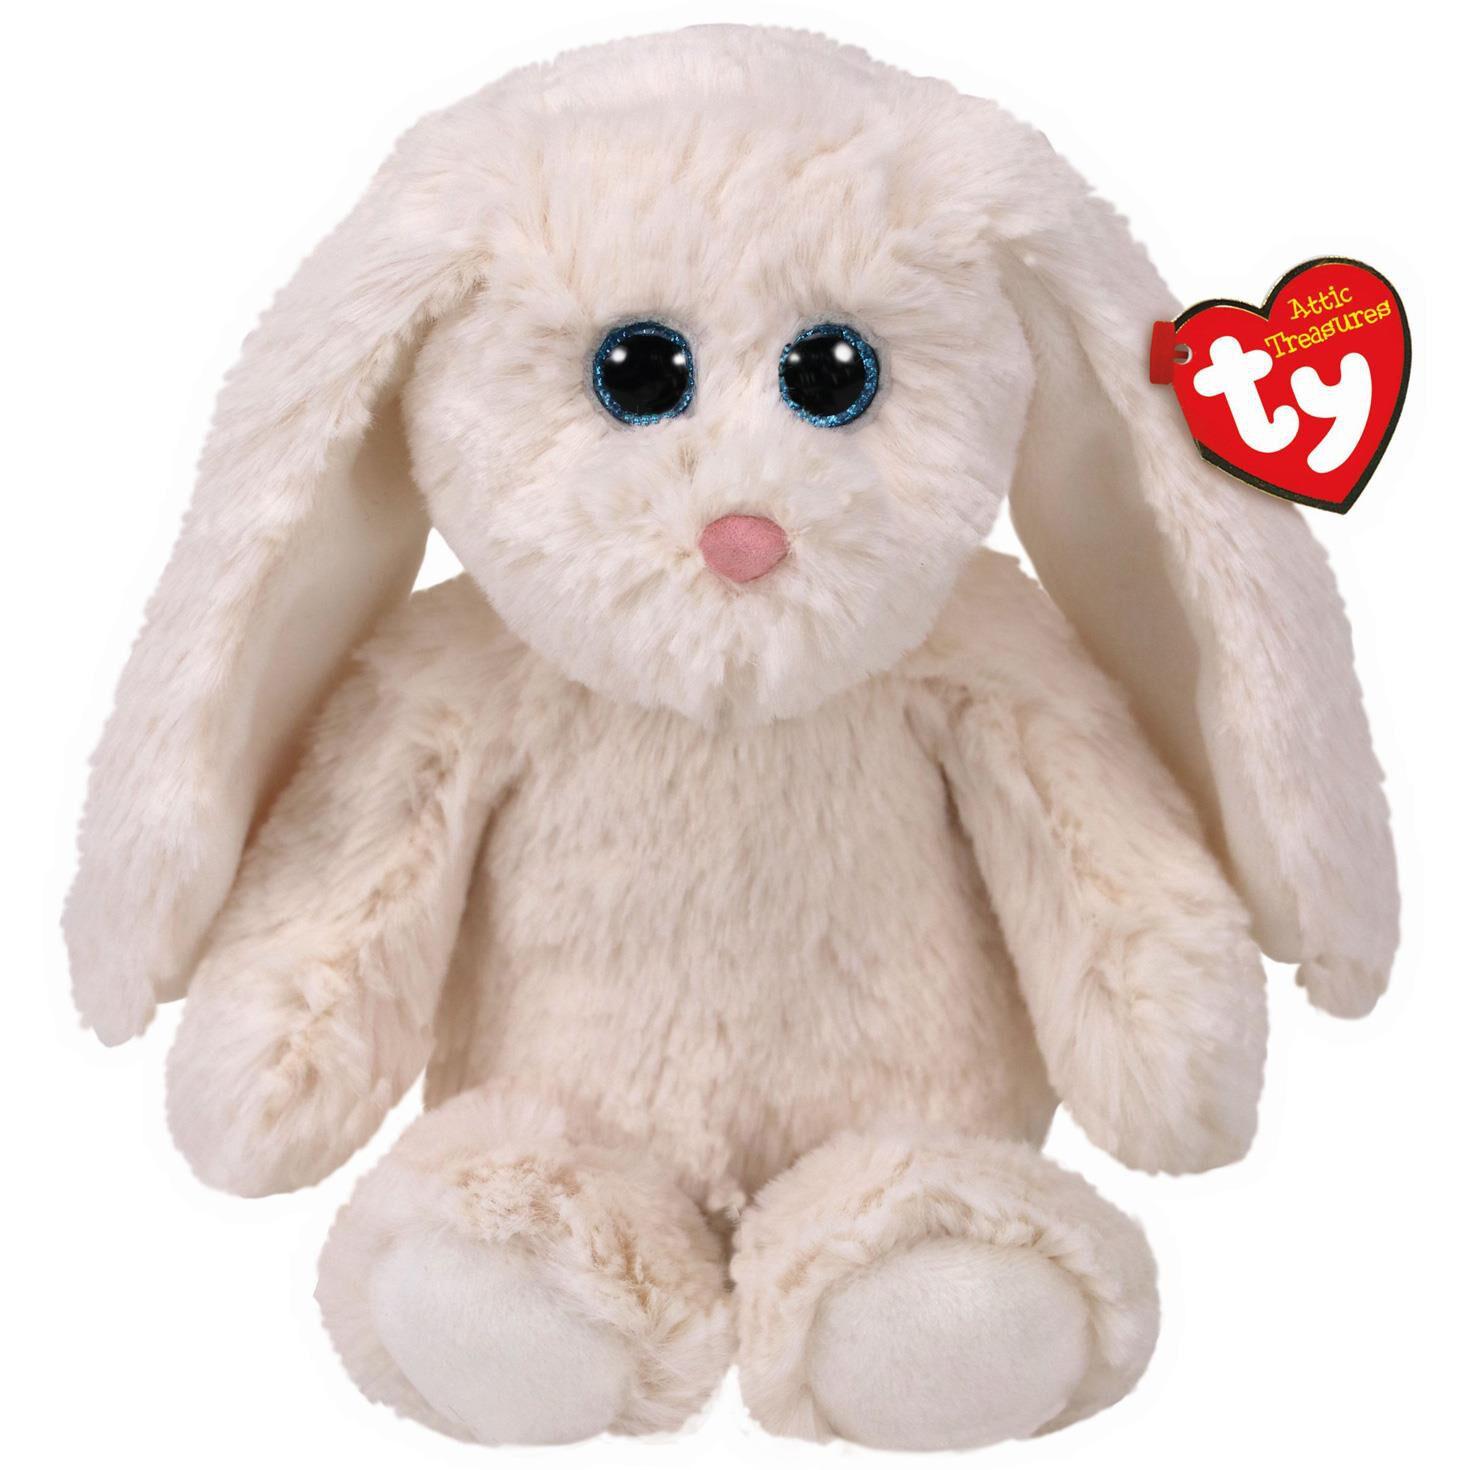 Ty® Attic Treasures Pearl Rabbit Stuffed Animal 13  - Classic Stuffed Animals - Hallmark  sc 1 st  Hallmark & Ty® Attic Treasures Pearl Rabbit Stuffed Animal 13